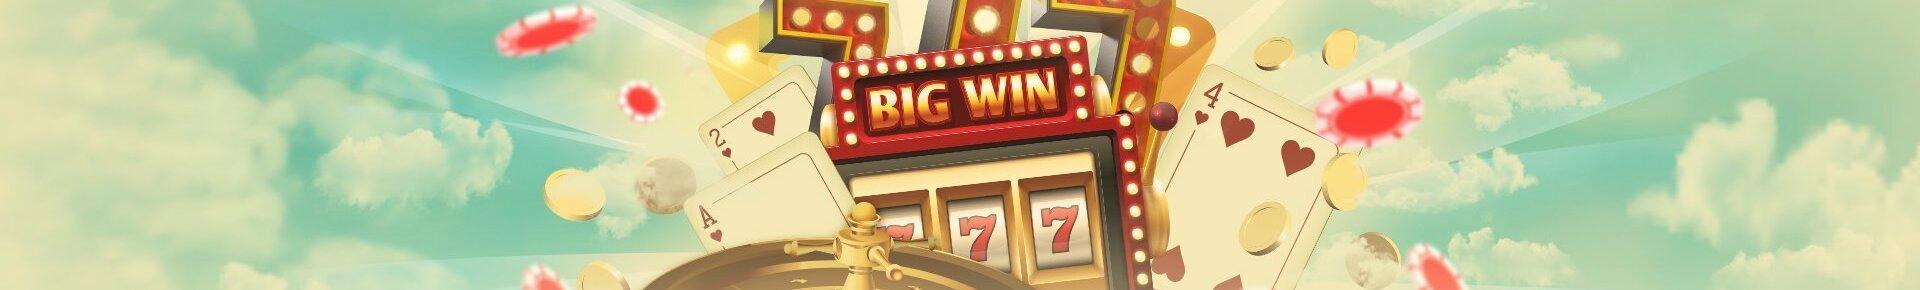 777 casino review UK